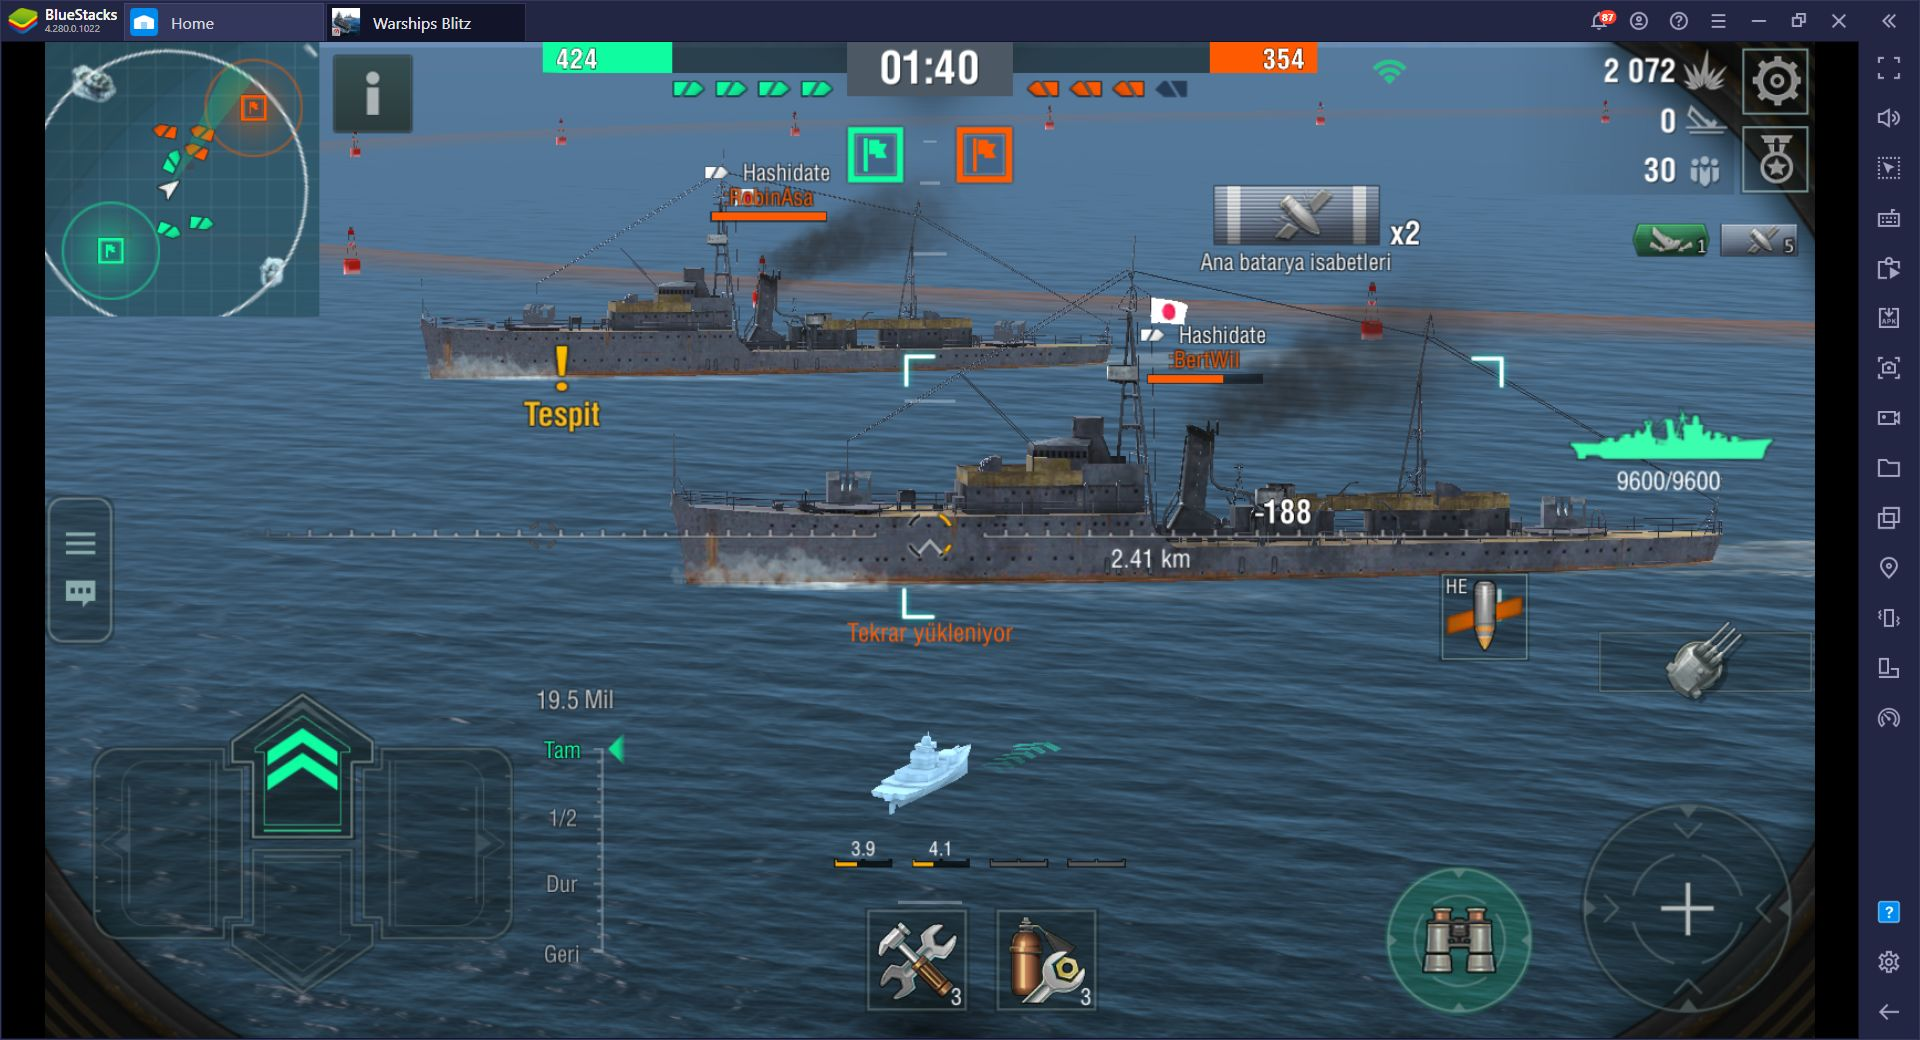 World of Warships Blitz: Android Platformundaki En İyi Deniz Savaşı Oyunu